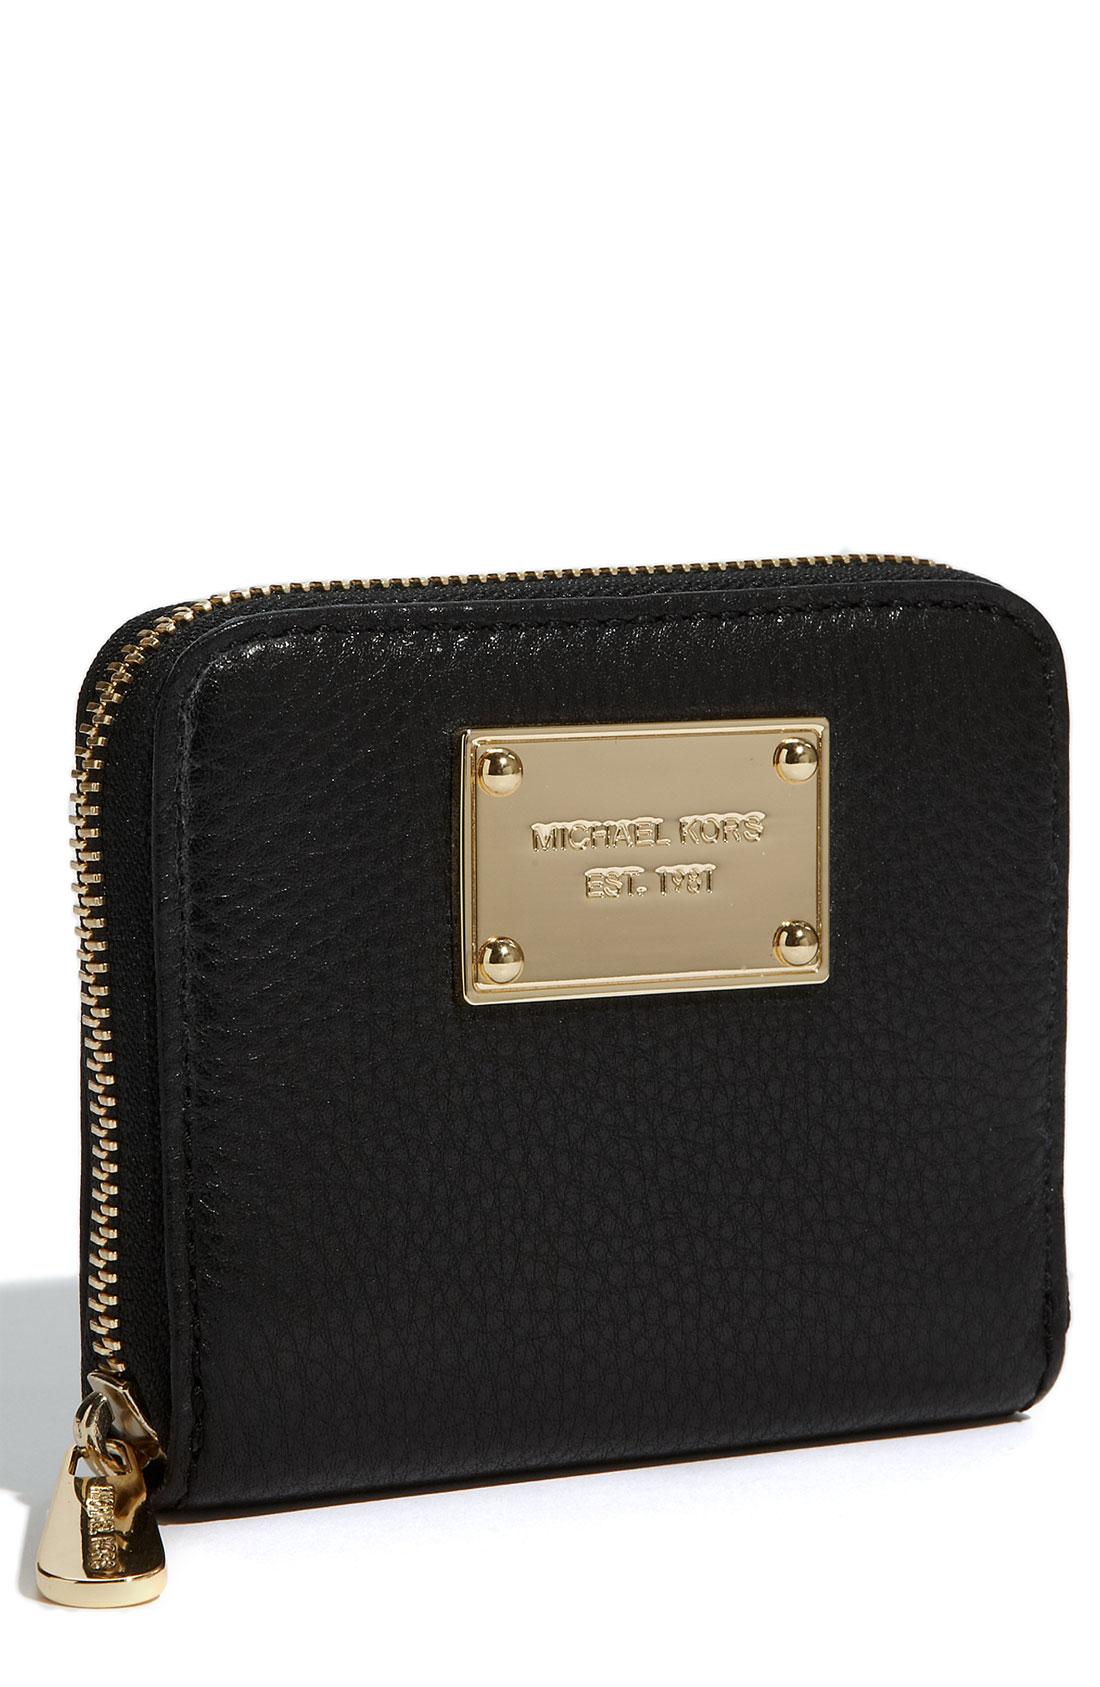 Small Black Wallet - Best Photo Wallet Justiceforkenny.Org 5aadc7bfa